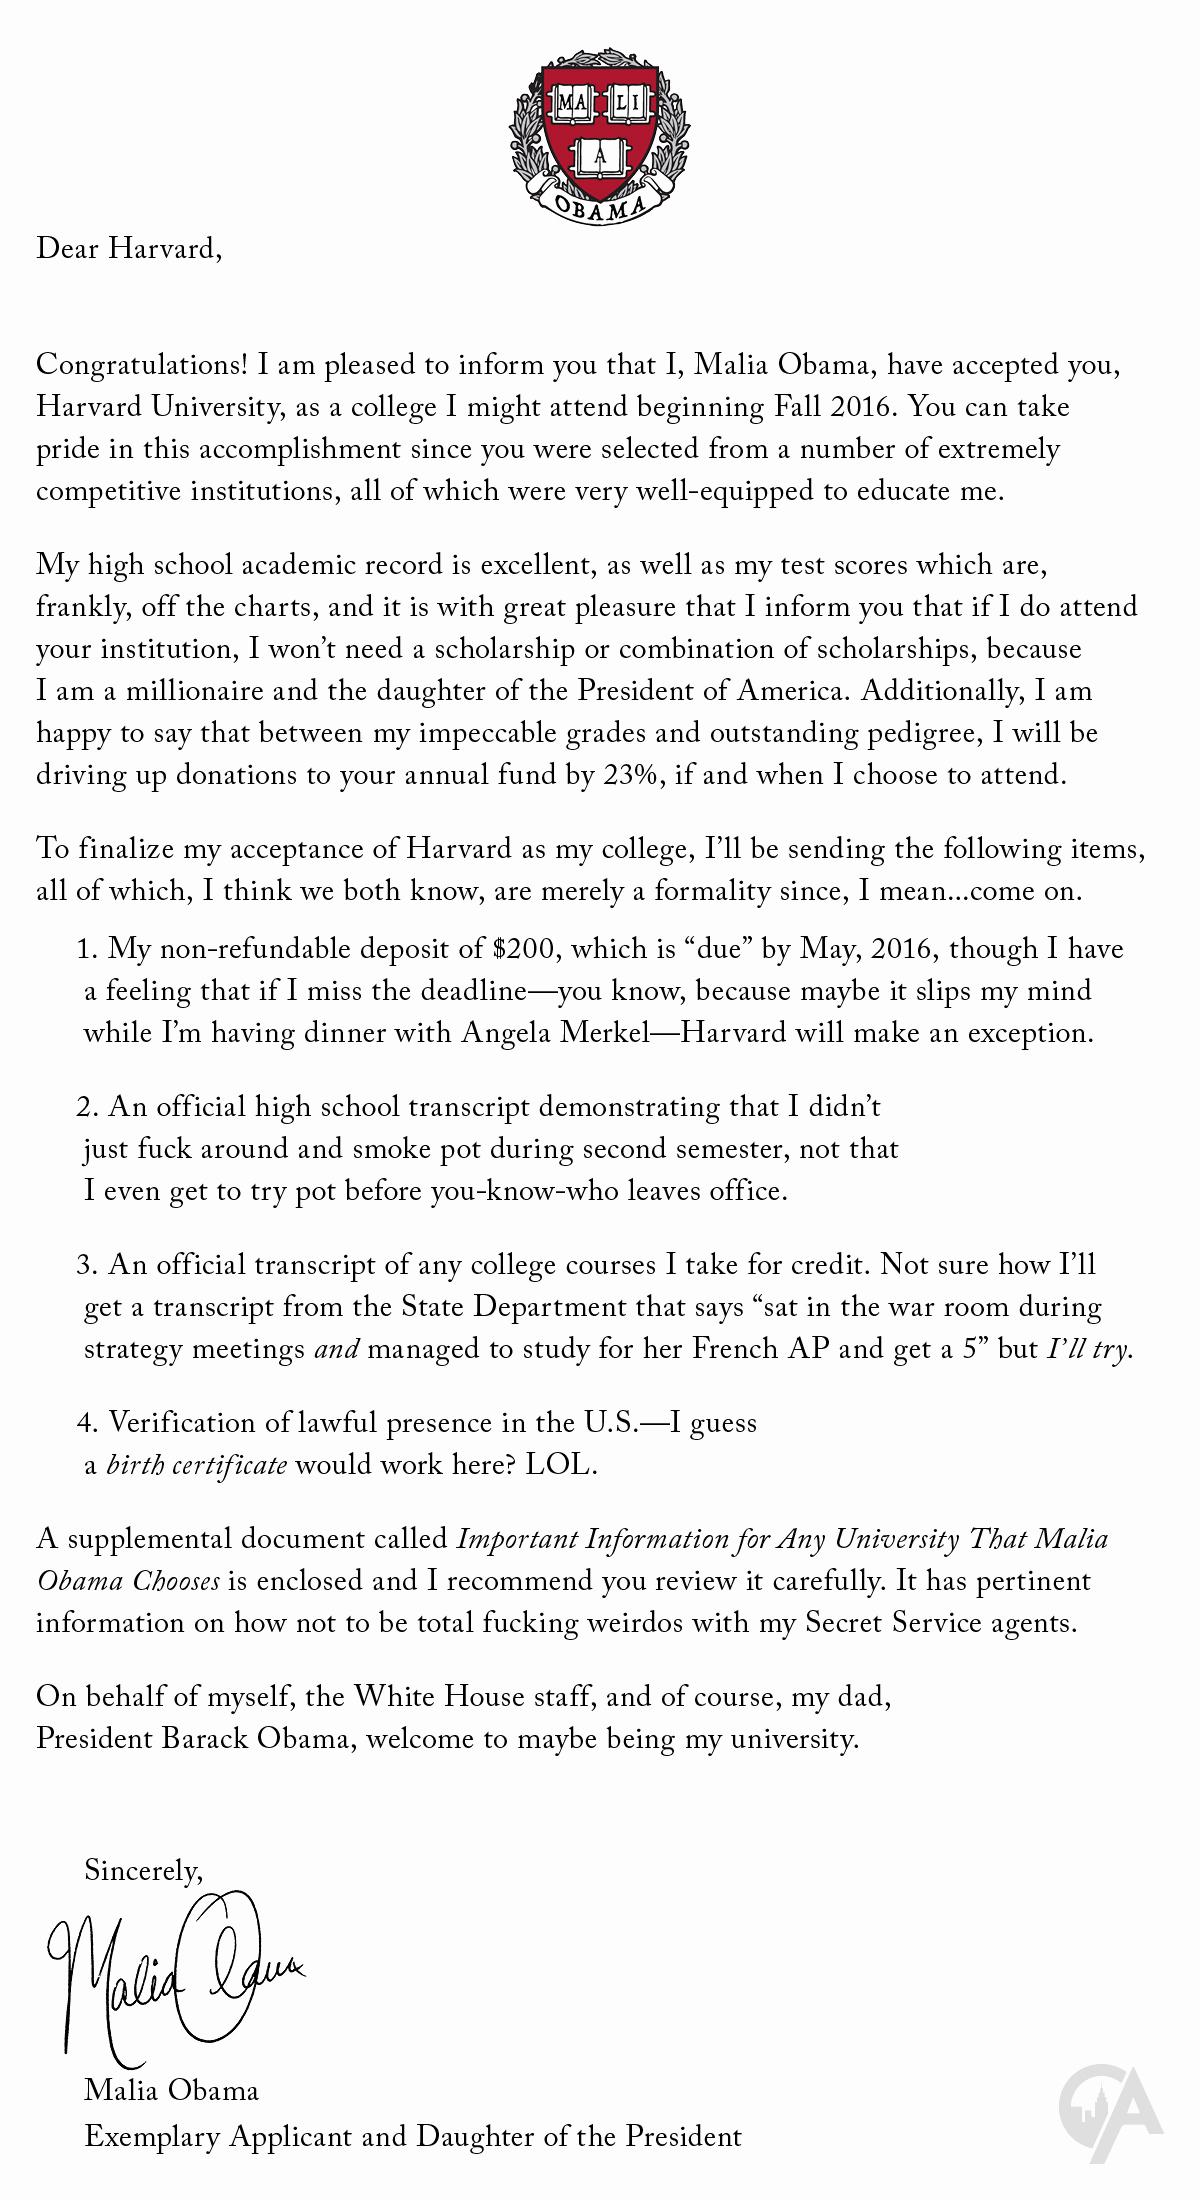 College Acceptance Letter Sample Best Of Malia Obama Sends Acceptance Letter to Harvard the